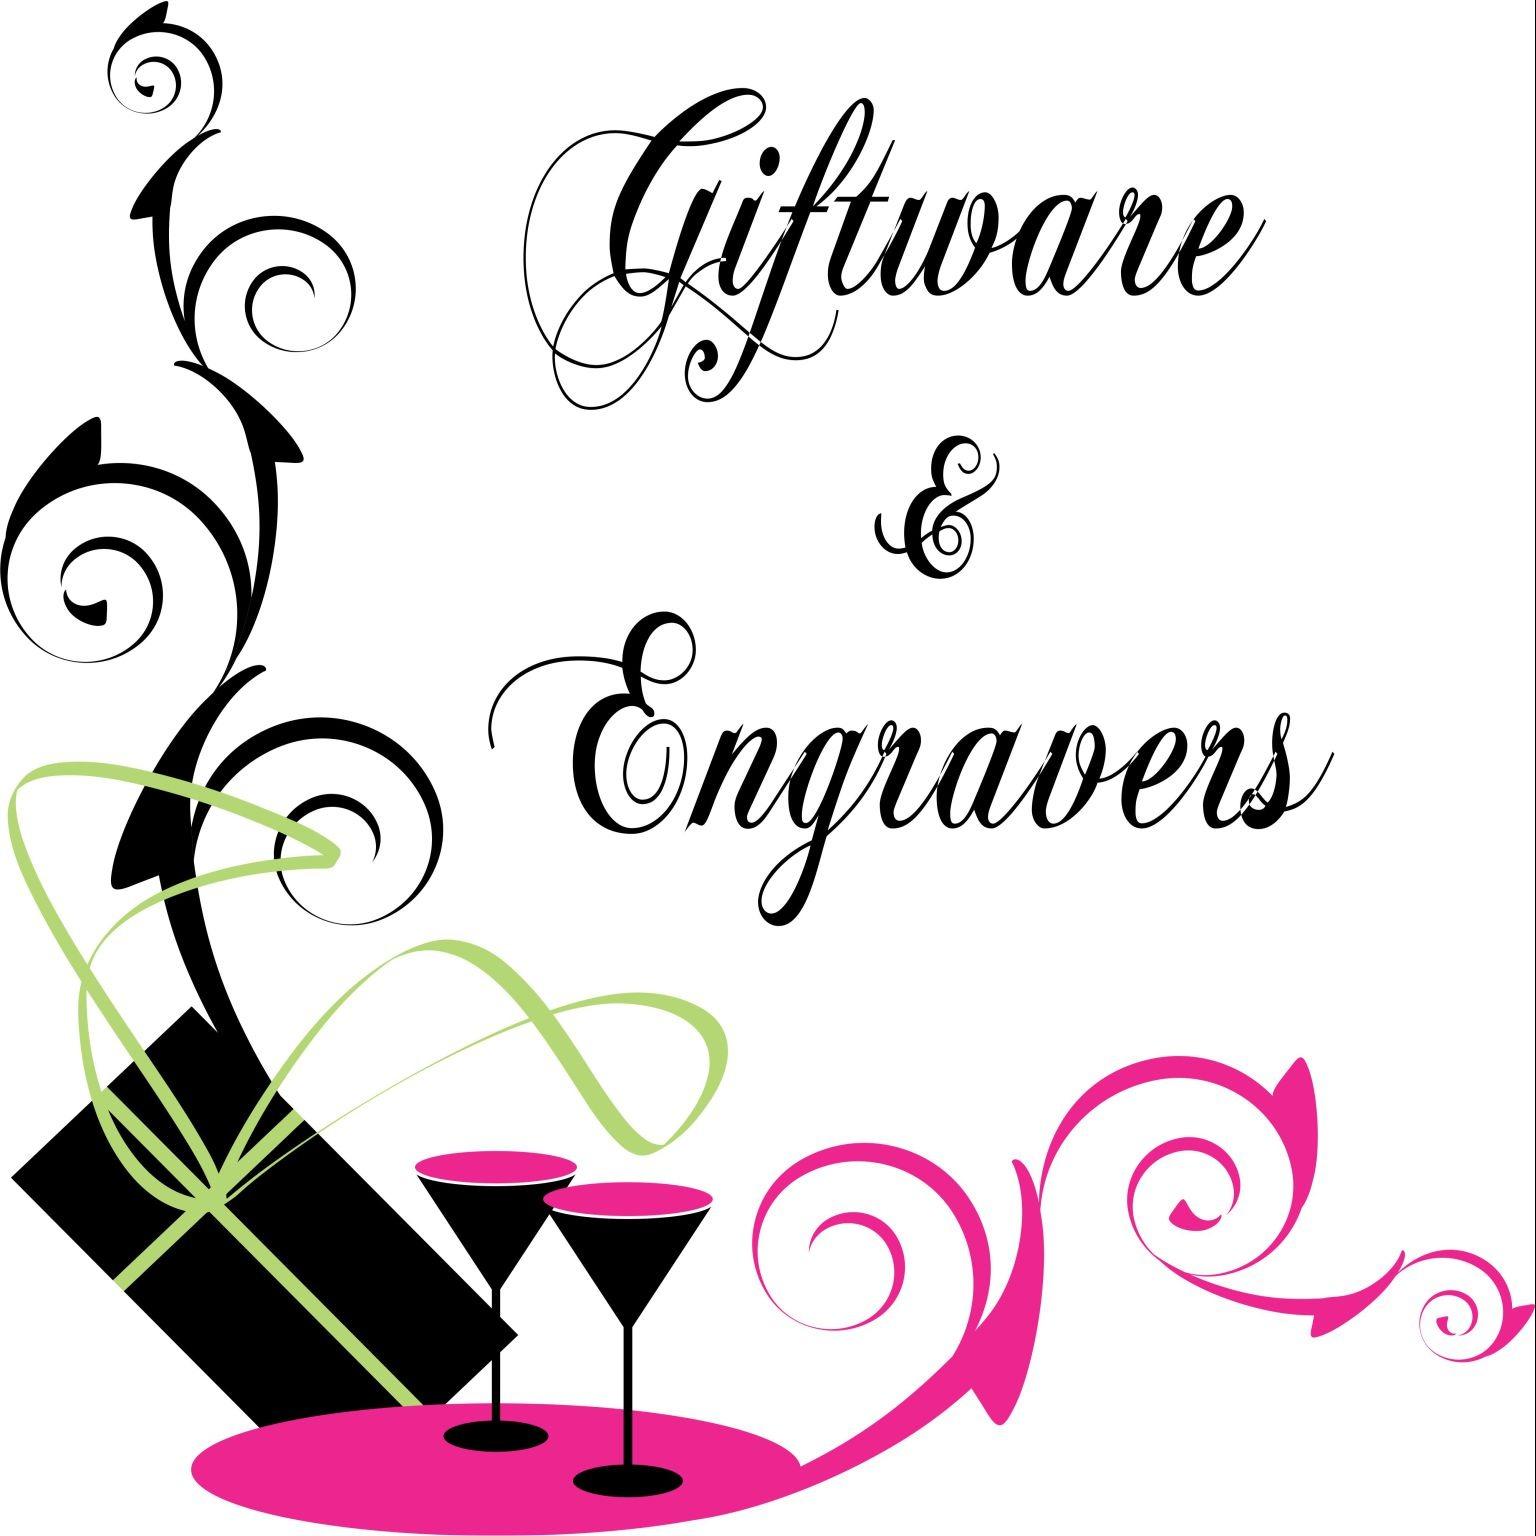 Giftware & Engravers